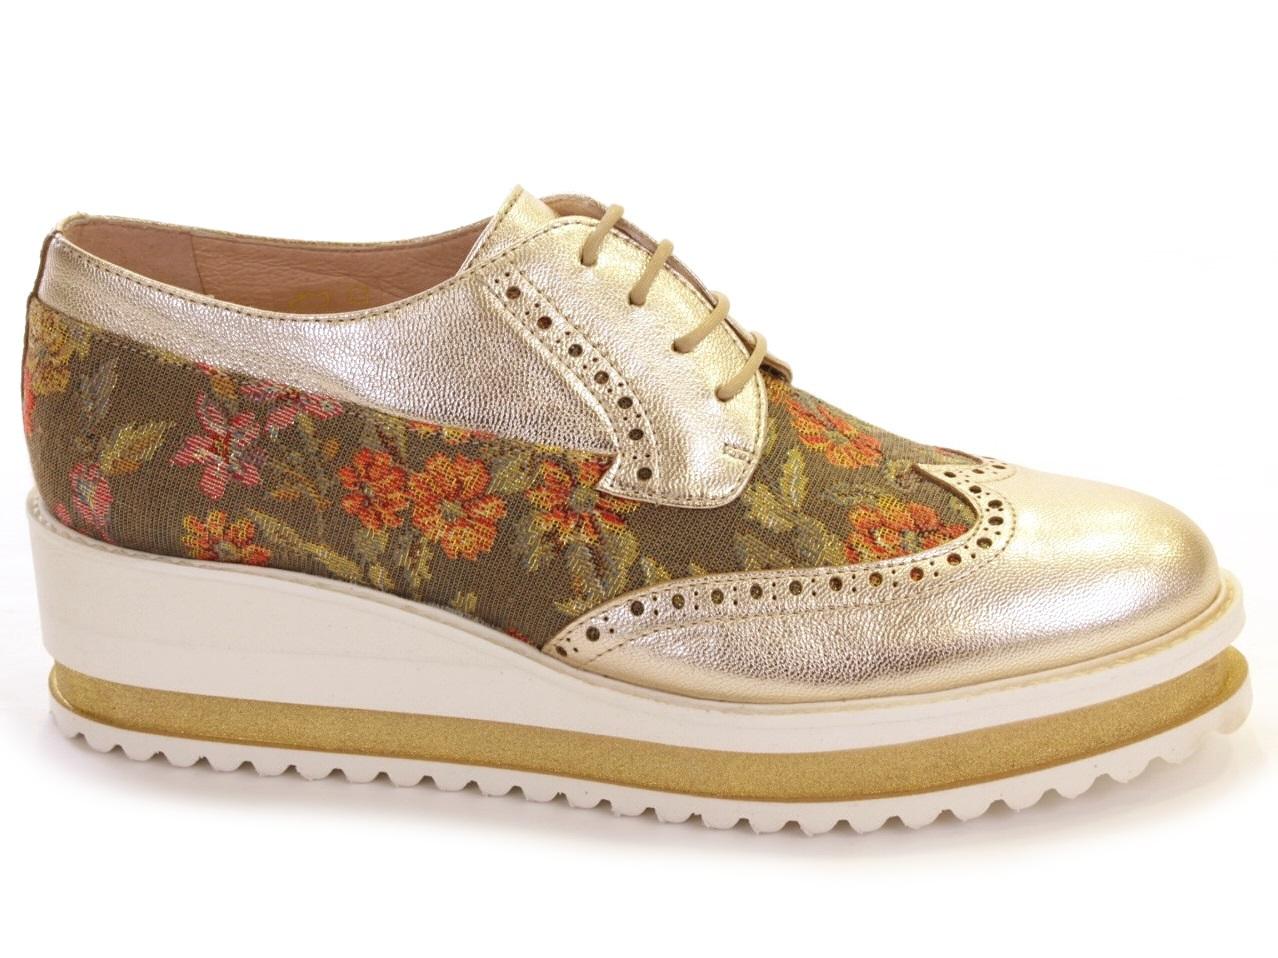 Wedge Shoes Sofia Costa - 085 8536